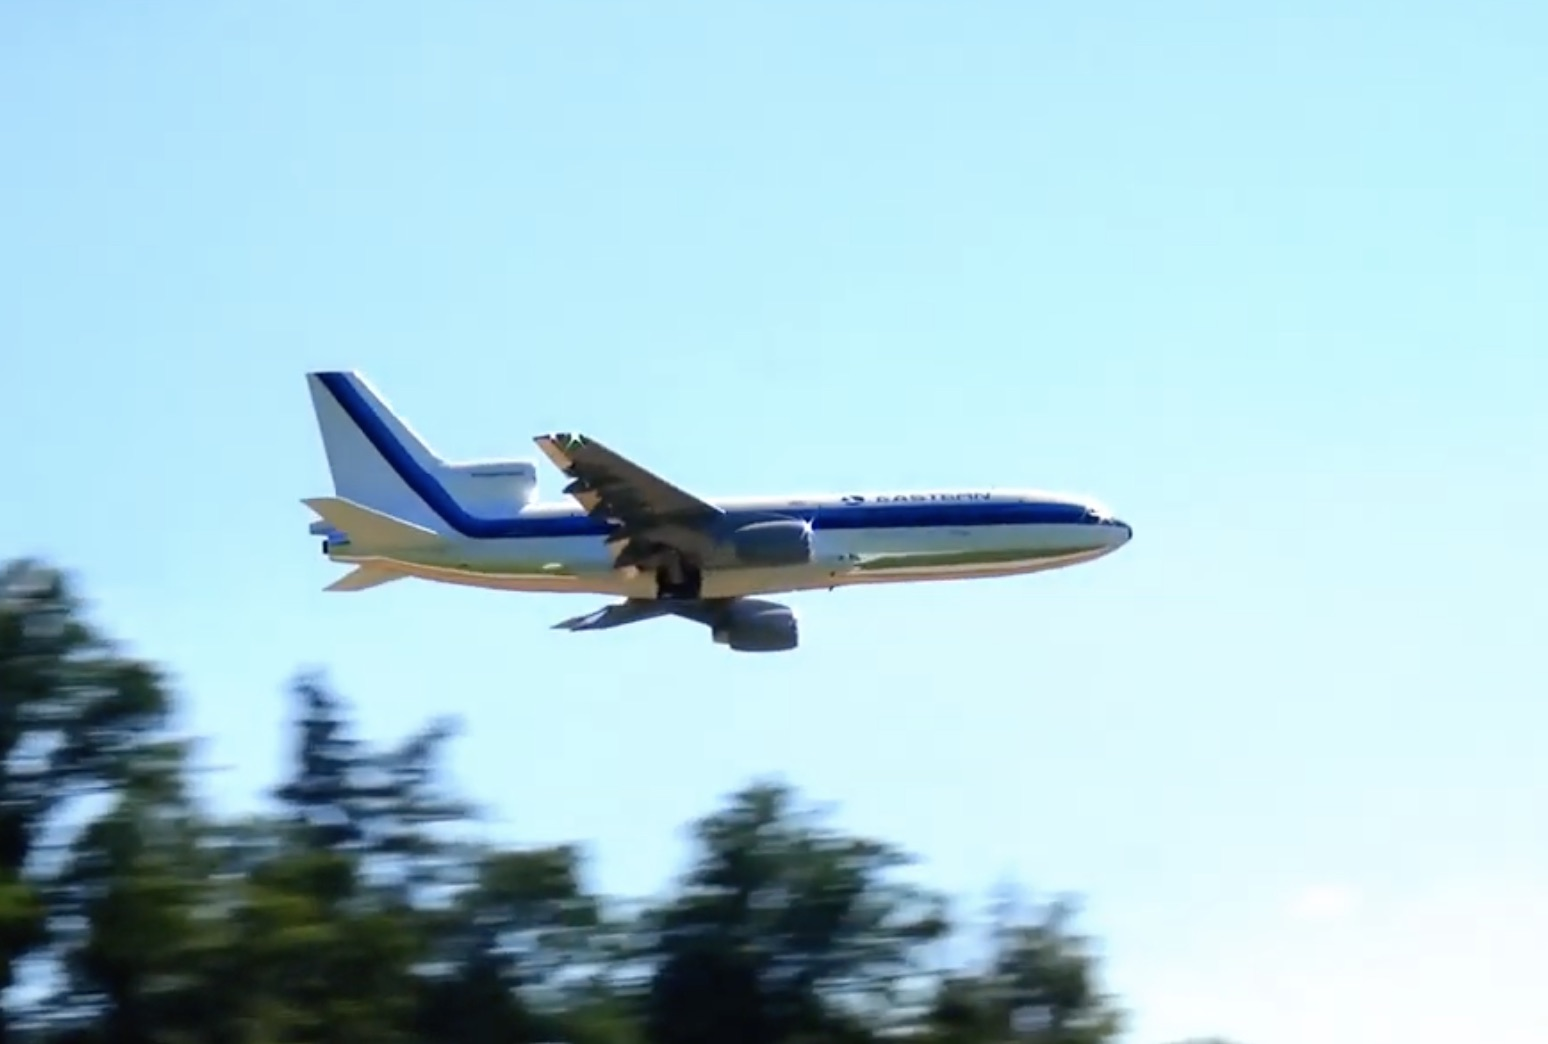 Scale Plane, Handbuilt Engine: This 1:16 Scale Lockheed L-1011 TriStar Is Fantastic!